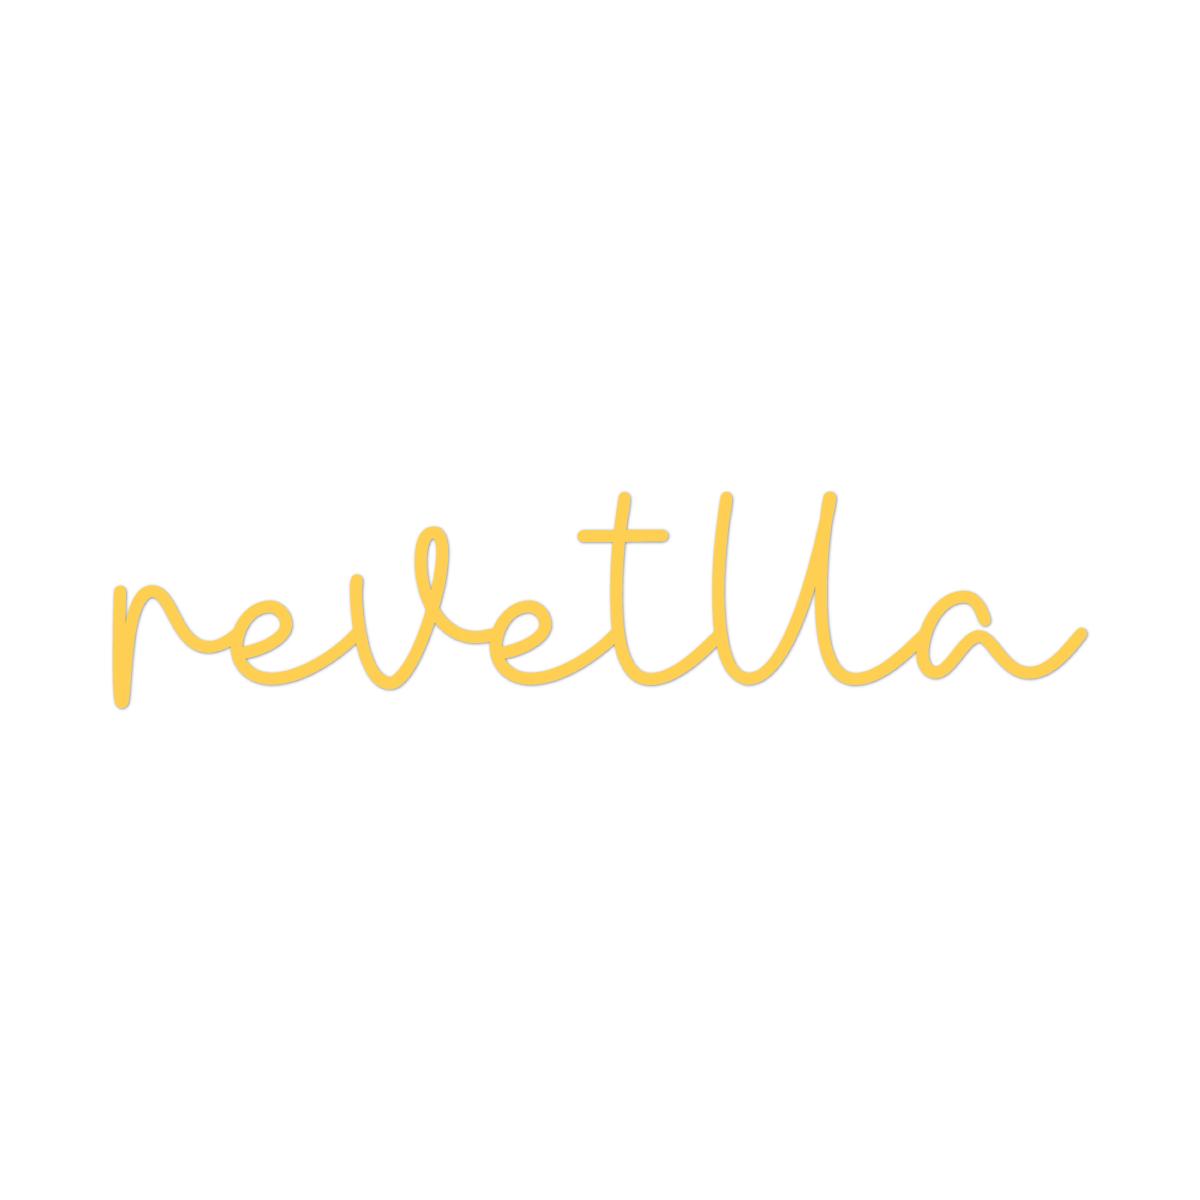 Palabra metacrilato Revetlla